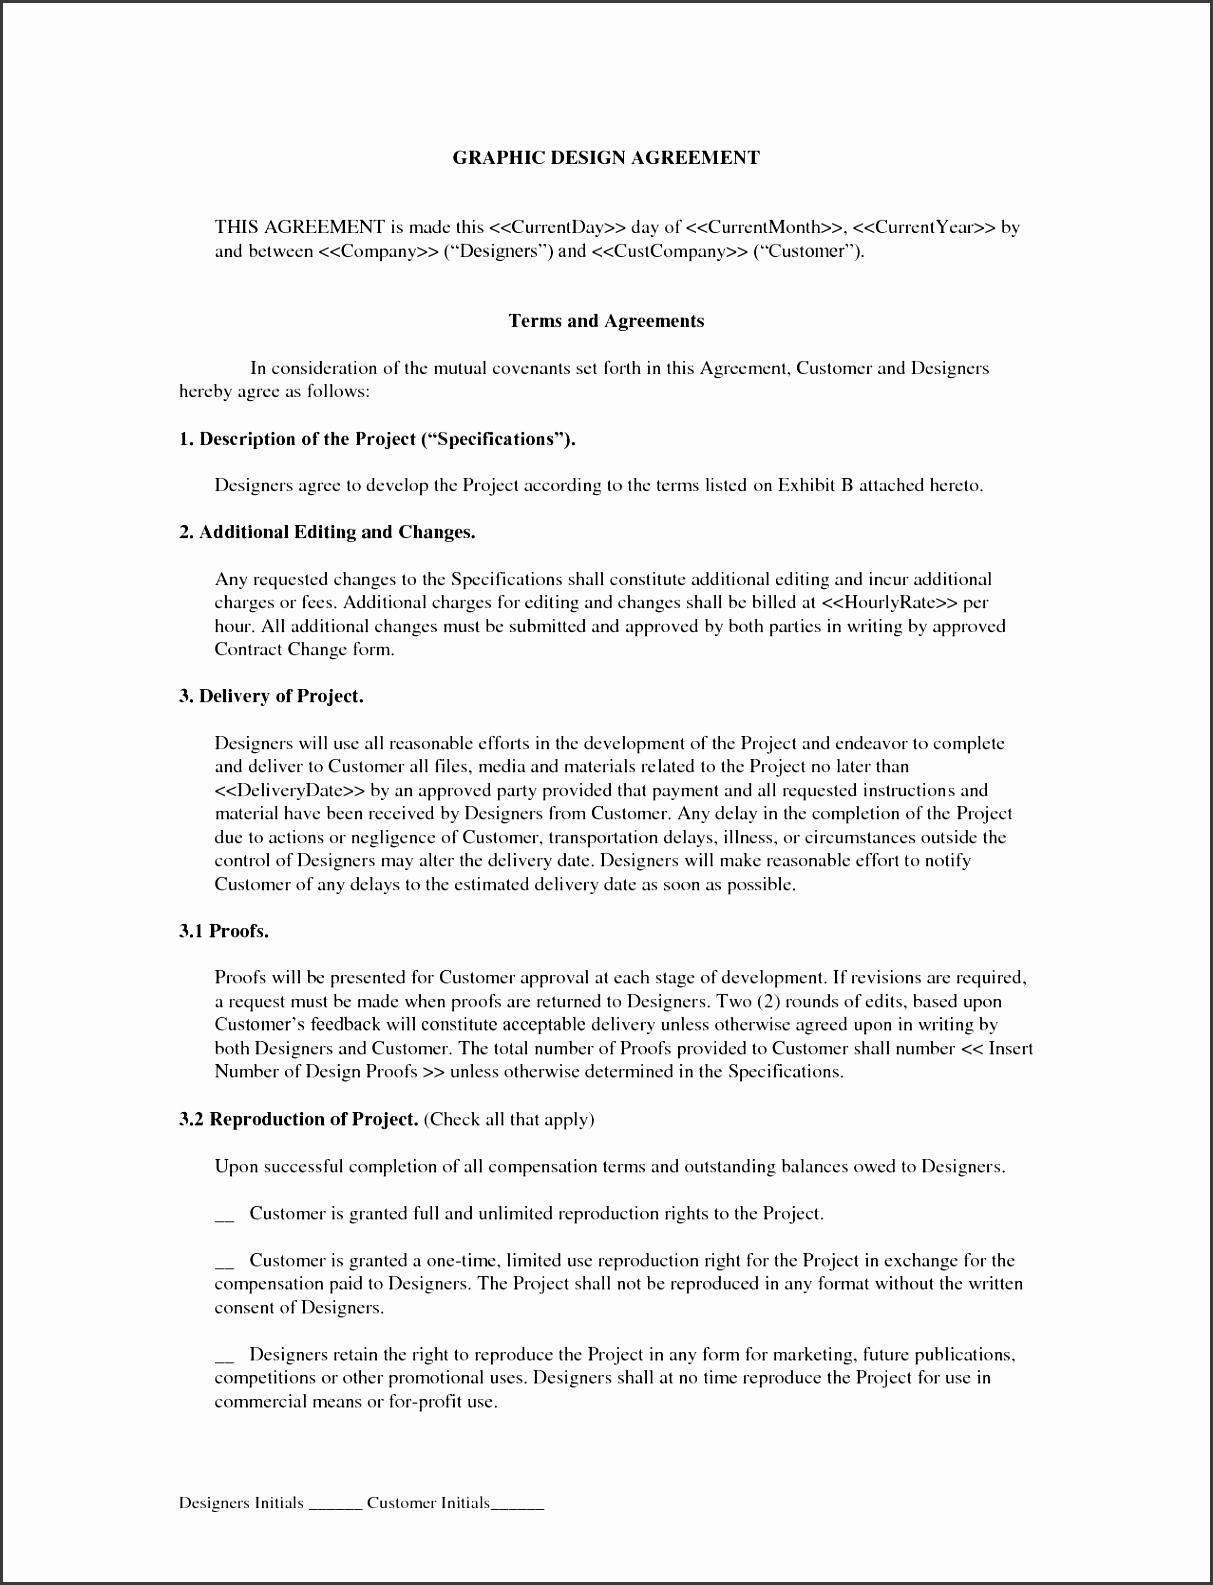 Personal Loan Agreement Between Friends Beautiful 10 Friend Loan Agreement Template Sampletemplatess